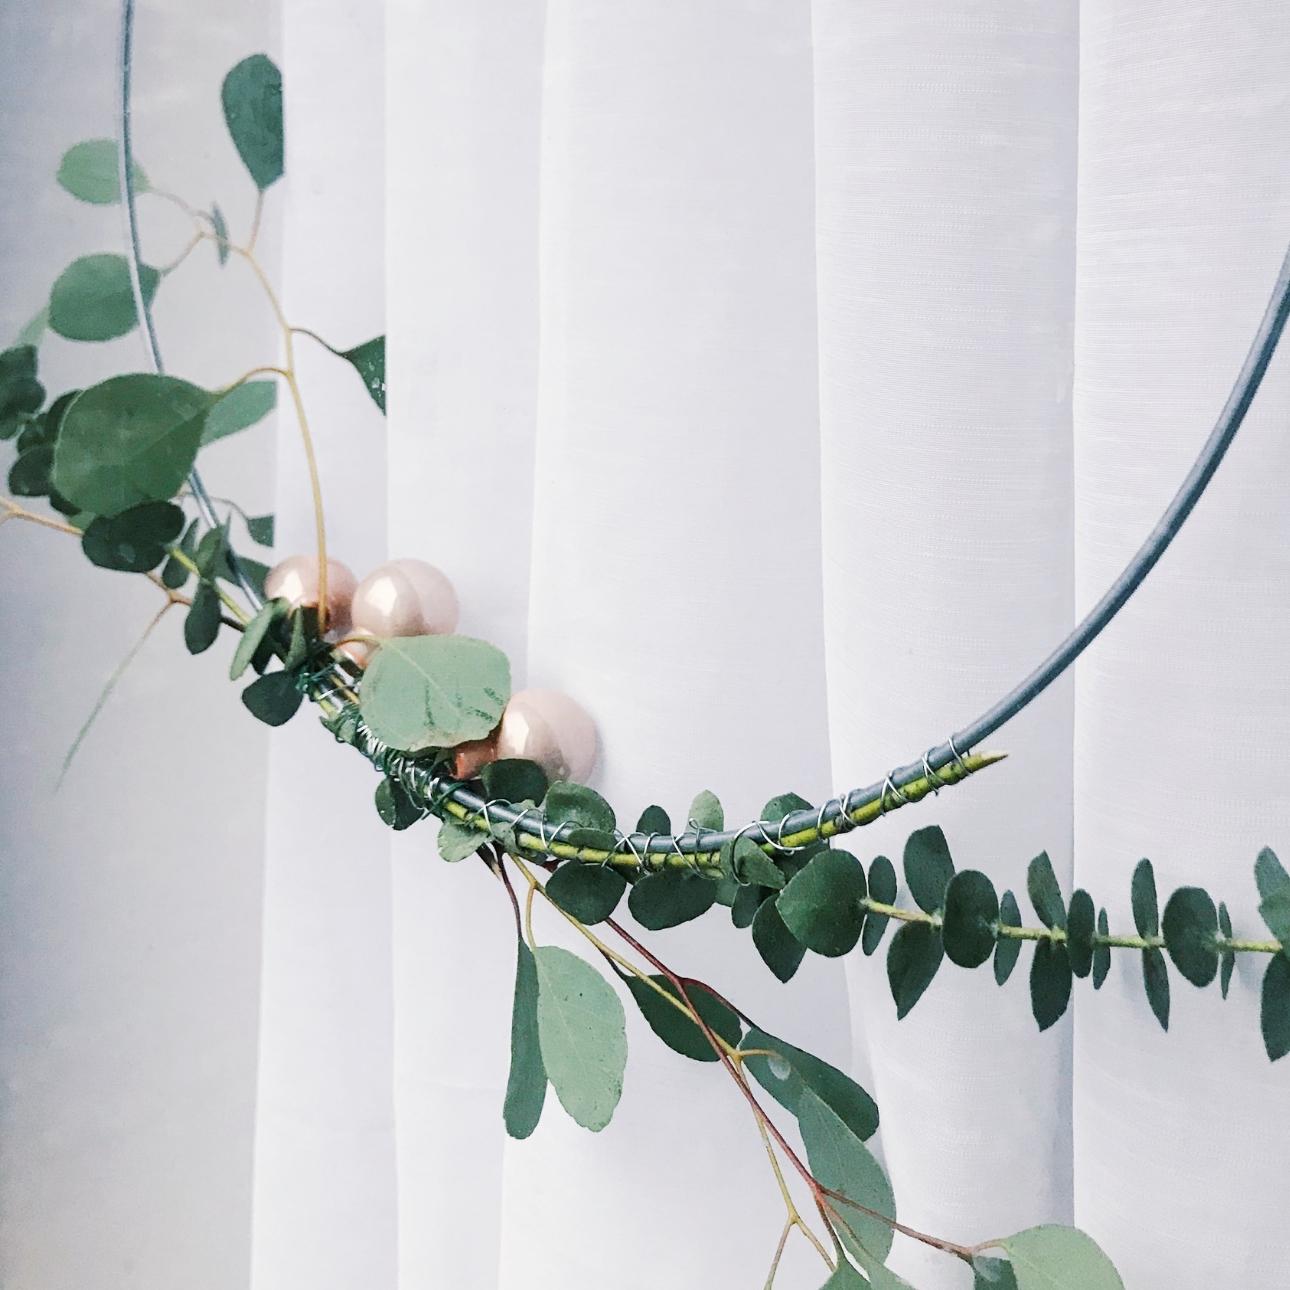 kerstkrans eucalyptus takken roze kerstballen achterkant